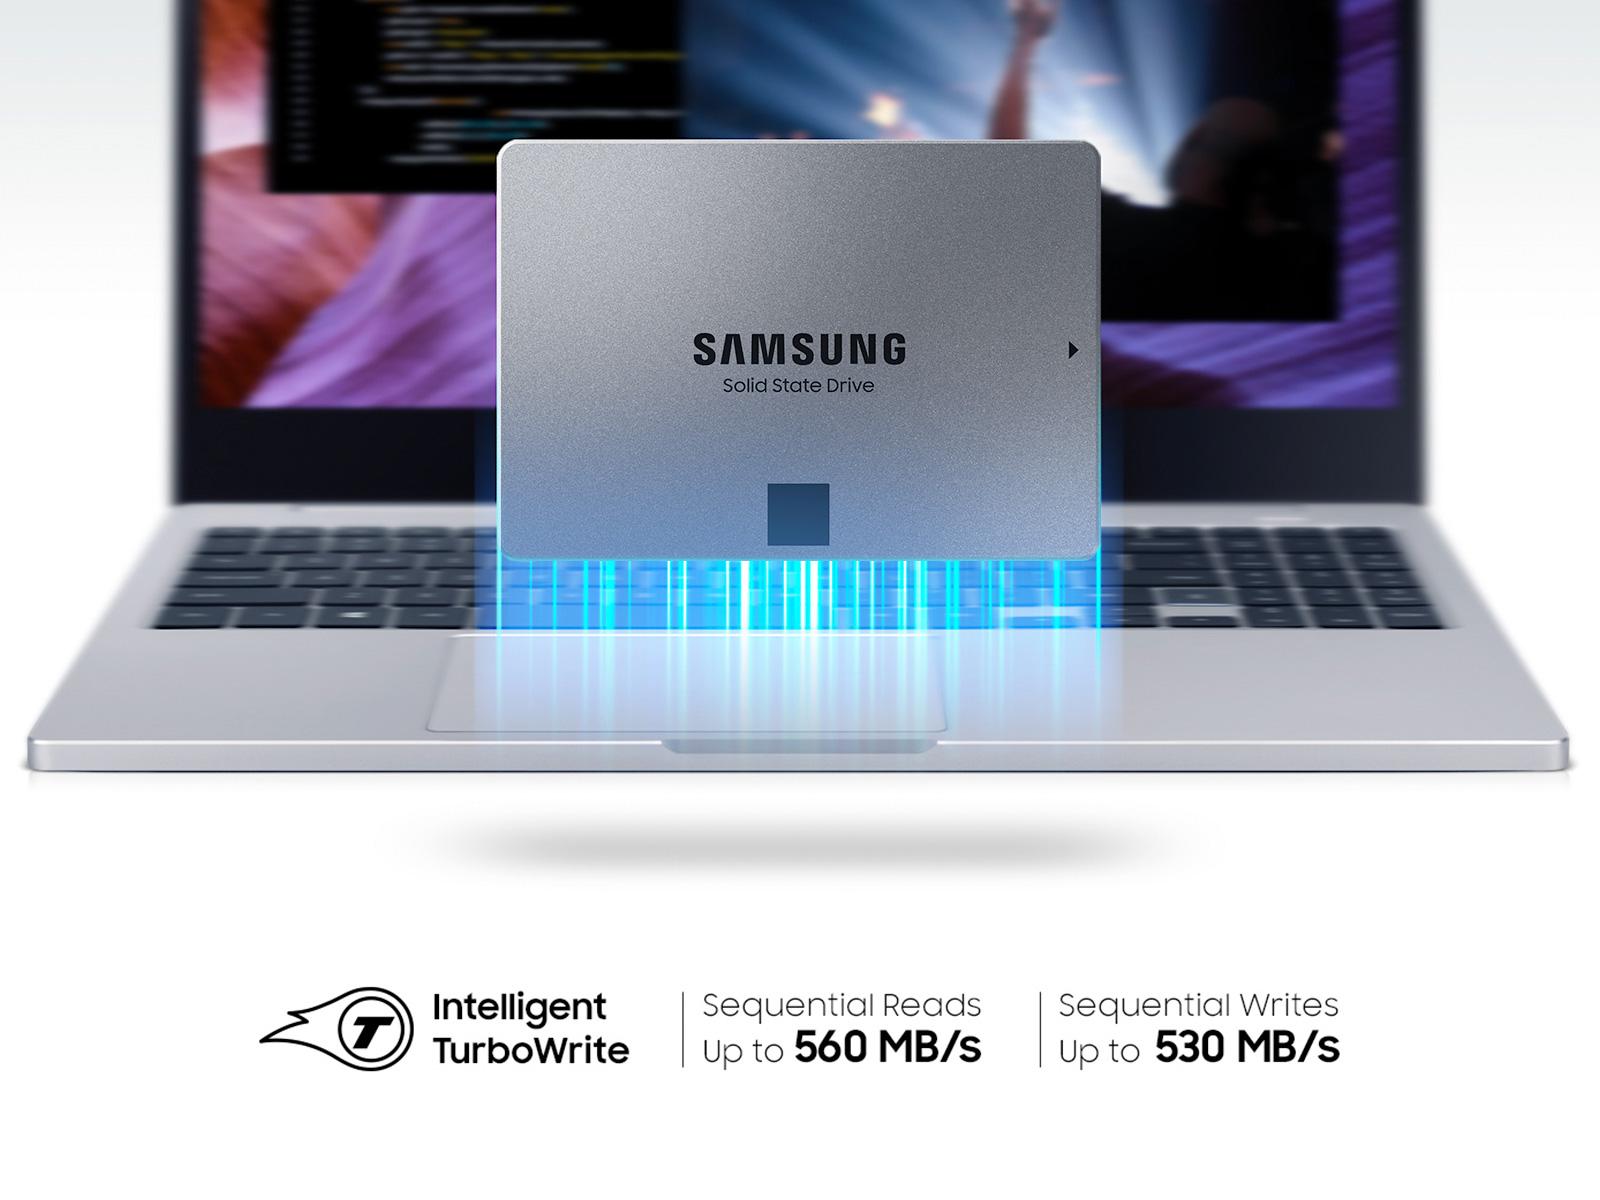 Ổ cứng SSD Samsung 870 QVO 1TB SATA III 2.5 Inch